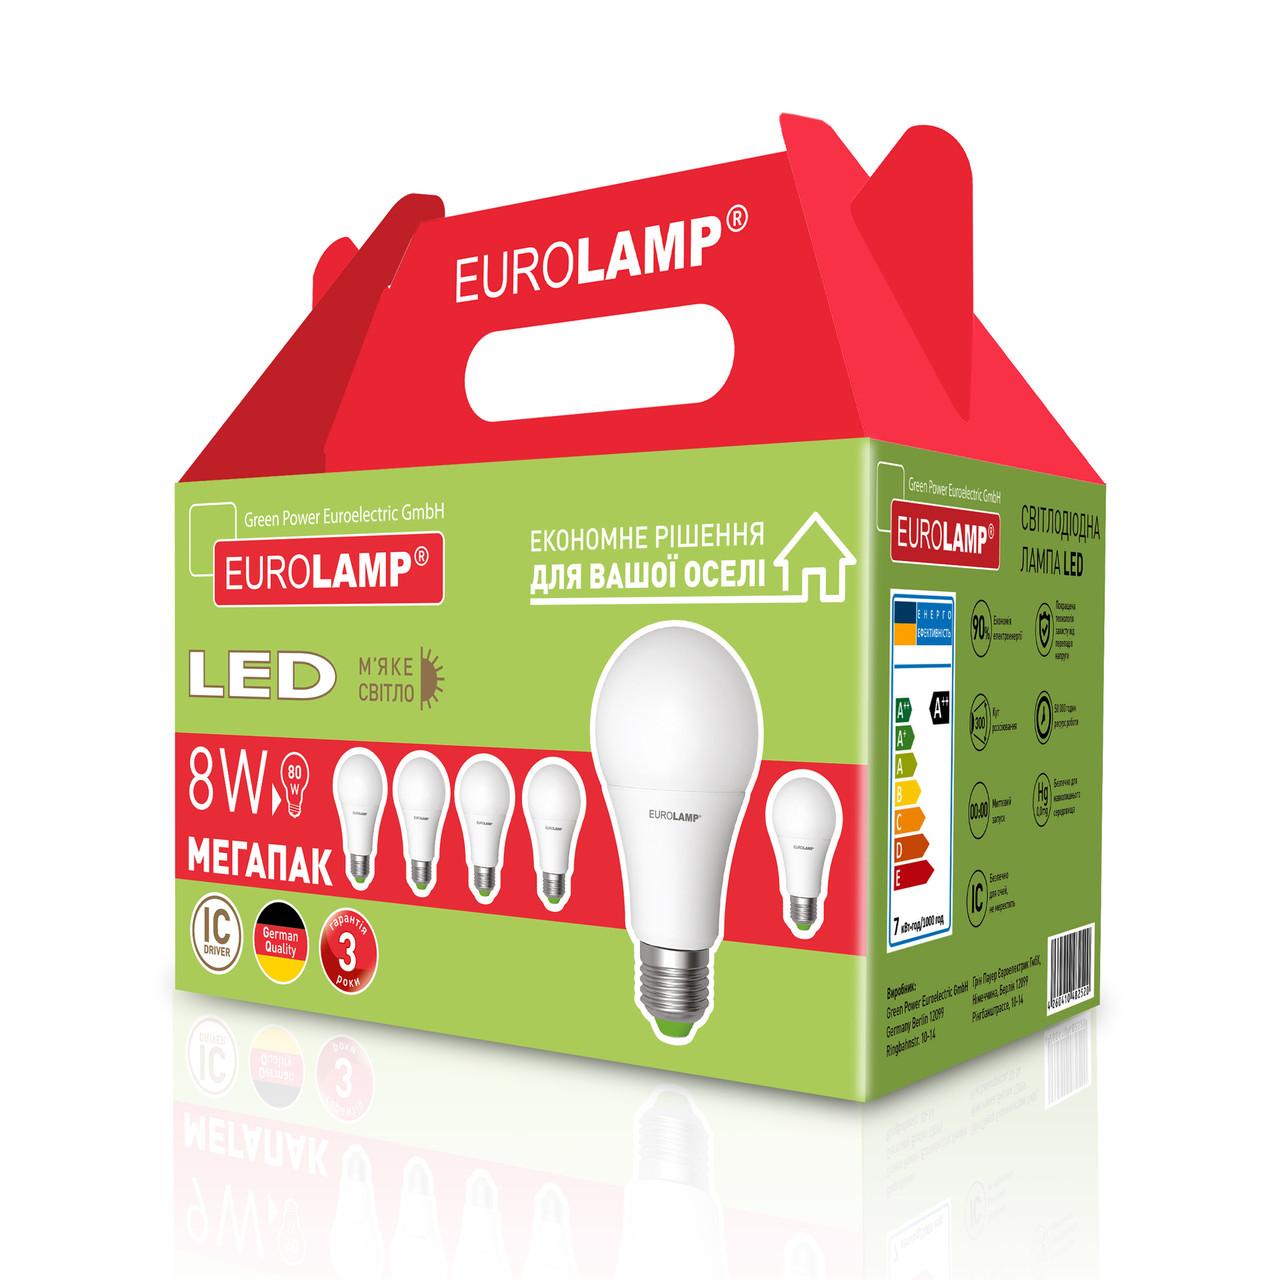 "Промо-набір EUROLAMP LED Лампа A60 8W E27 3000K акція ""6в1"""